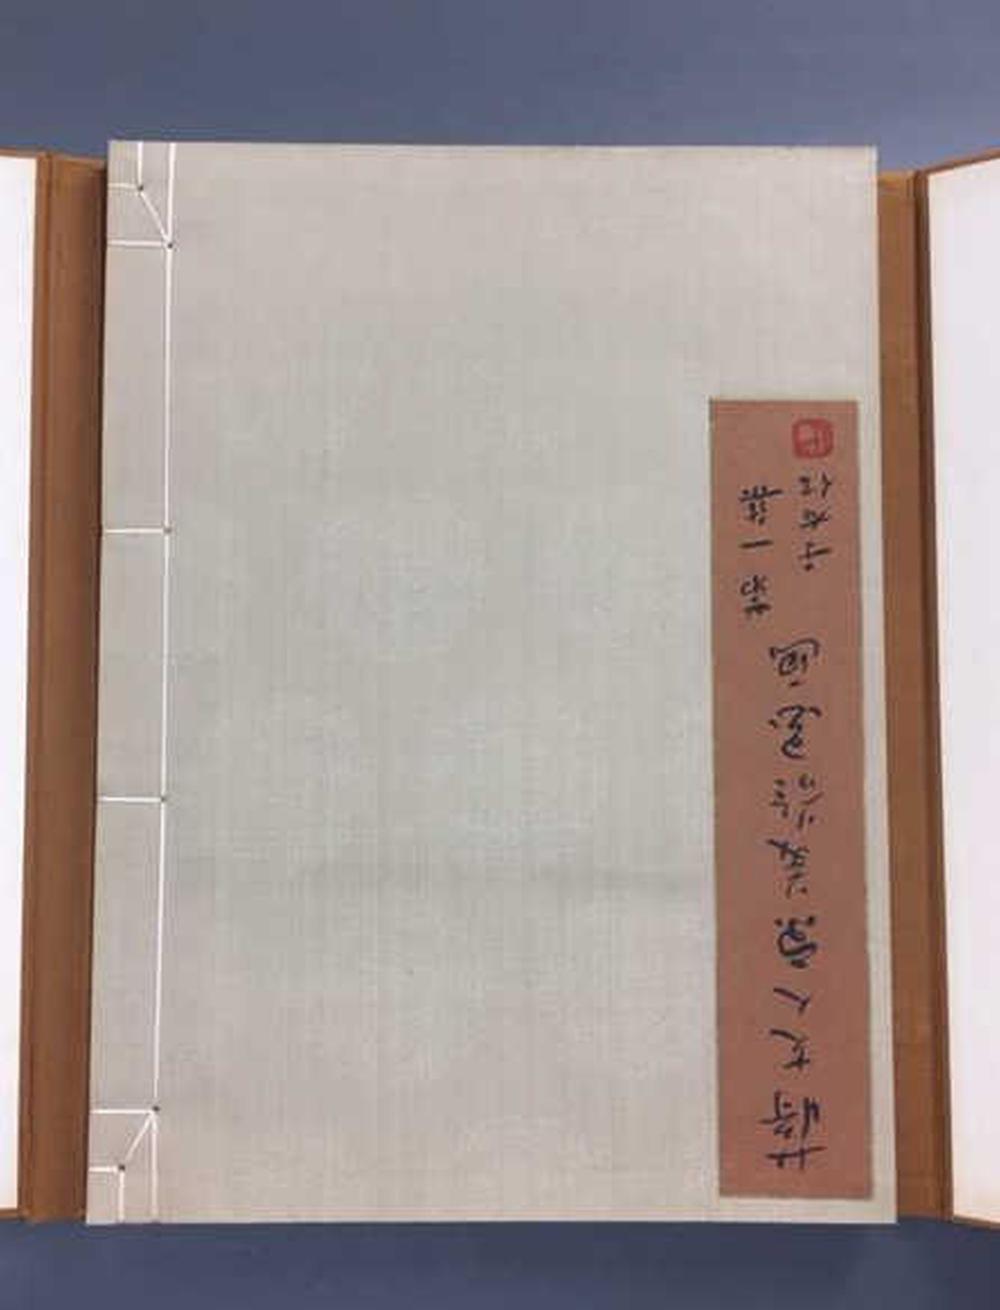 Lot 235: Paintings by Madame Chiang Kai-Shek. Vols. I & II.